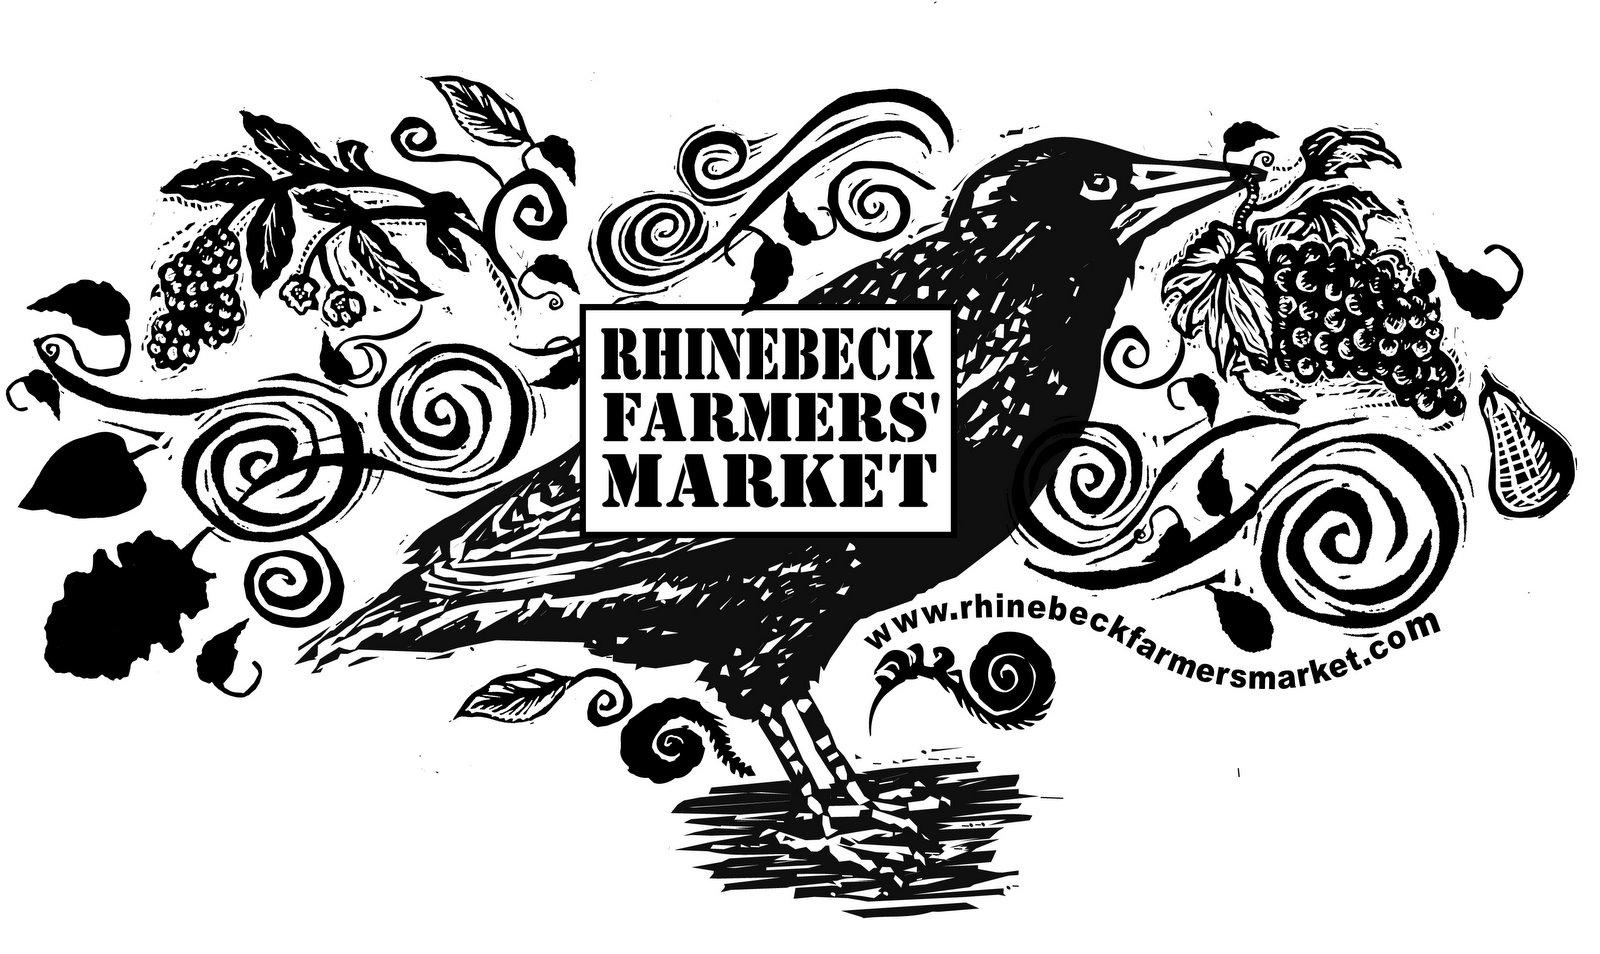 Rhinebeck Farmers' Market